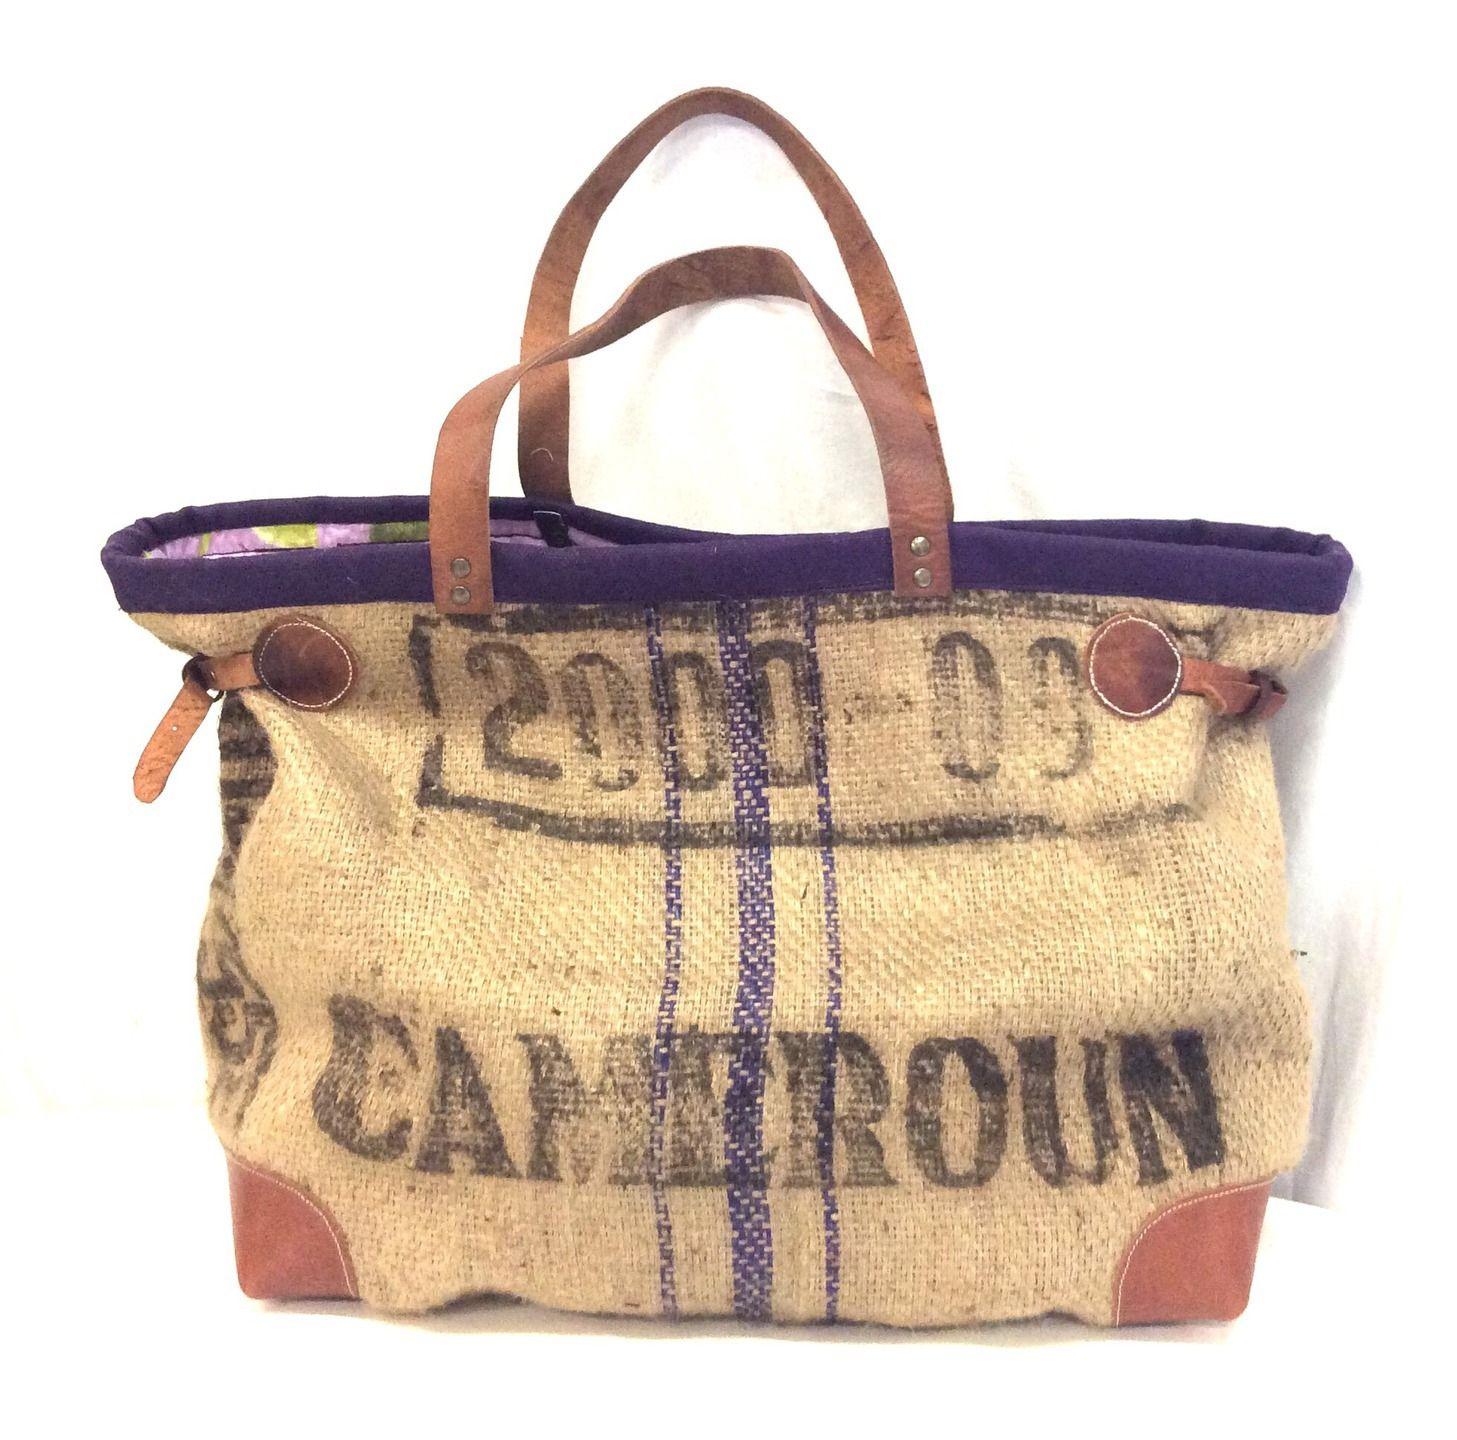 sac cabas toile de jute recycl e violet cuir sacs. Black Bedroom Furniture Sets. Home Design Ideas